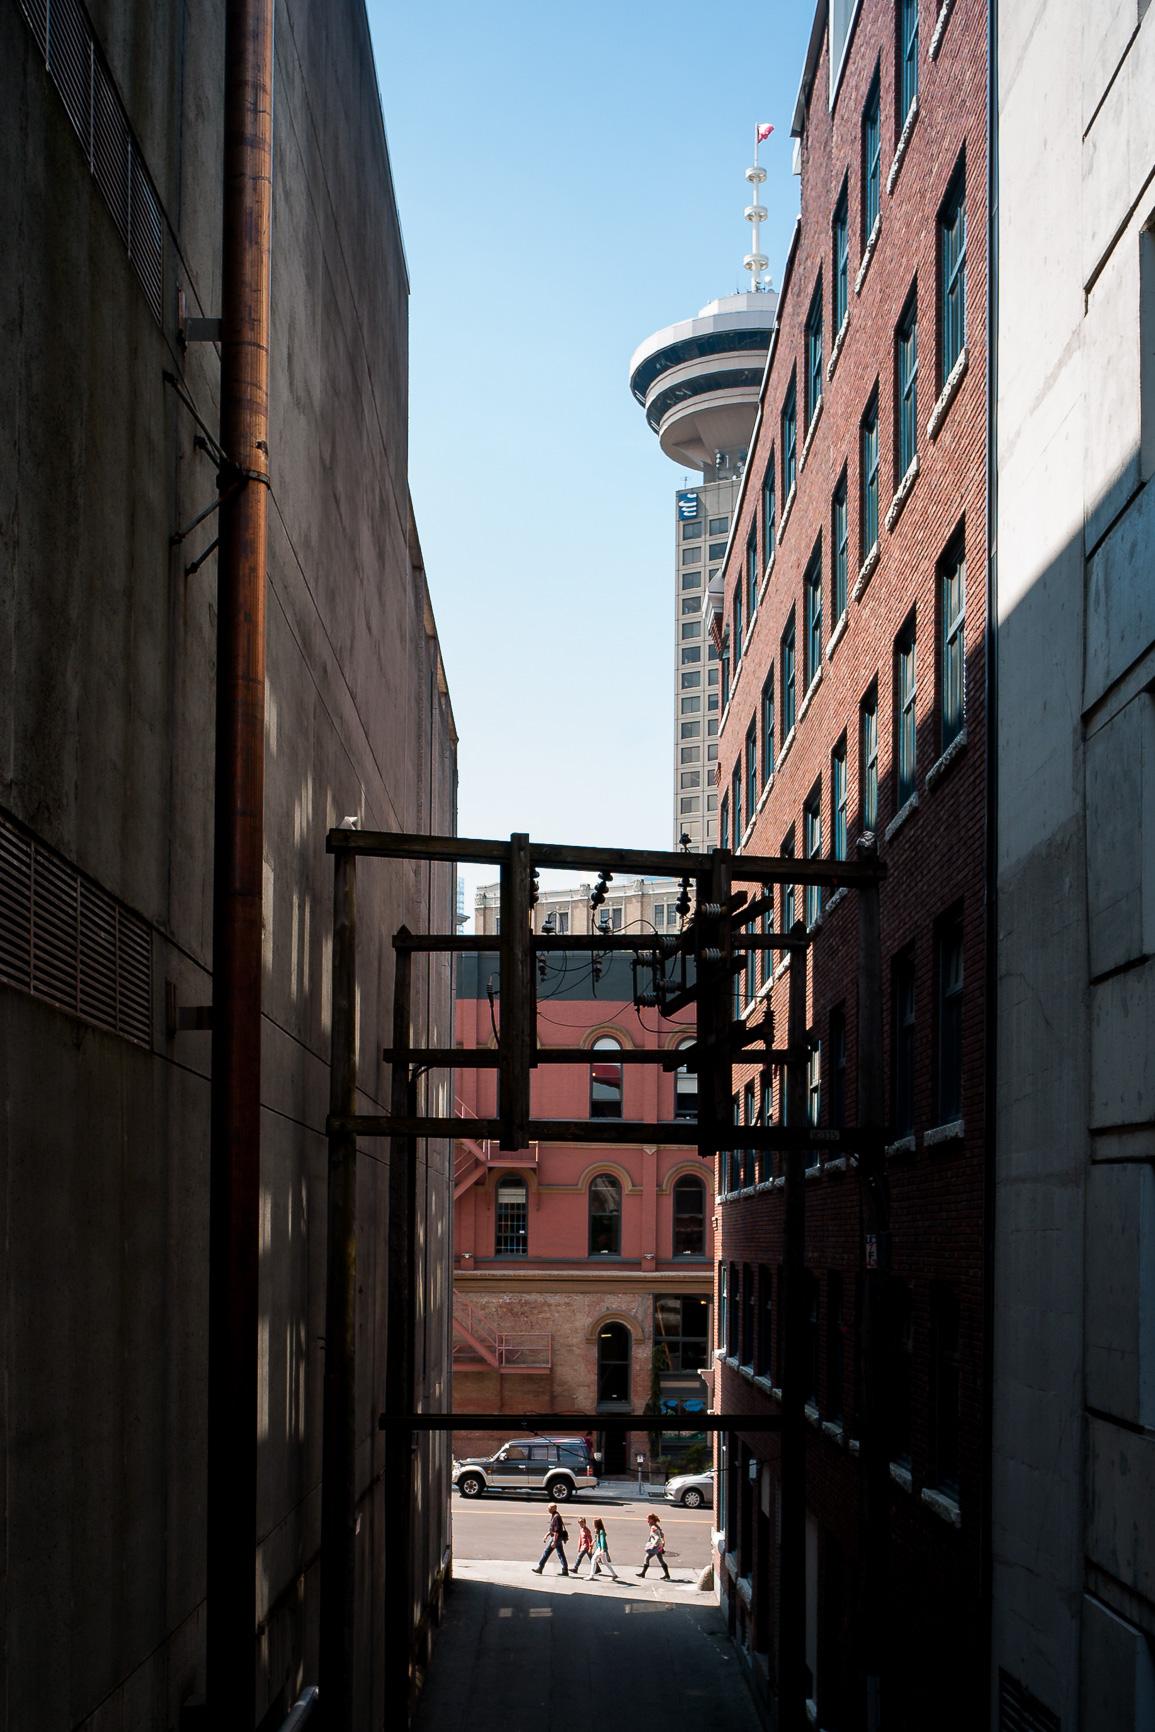 Leica M8.2 | Voigtlander Color-Skopar 21mm f/4